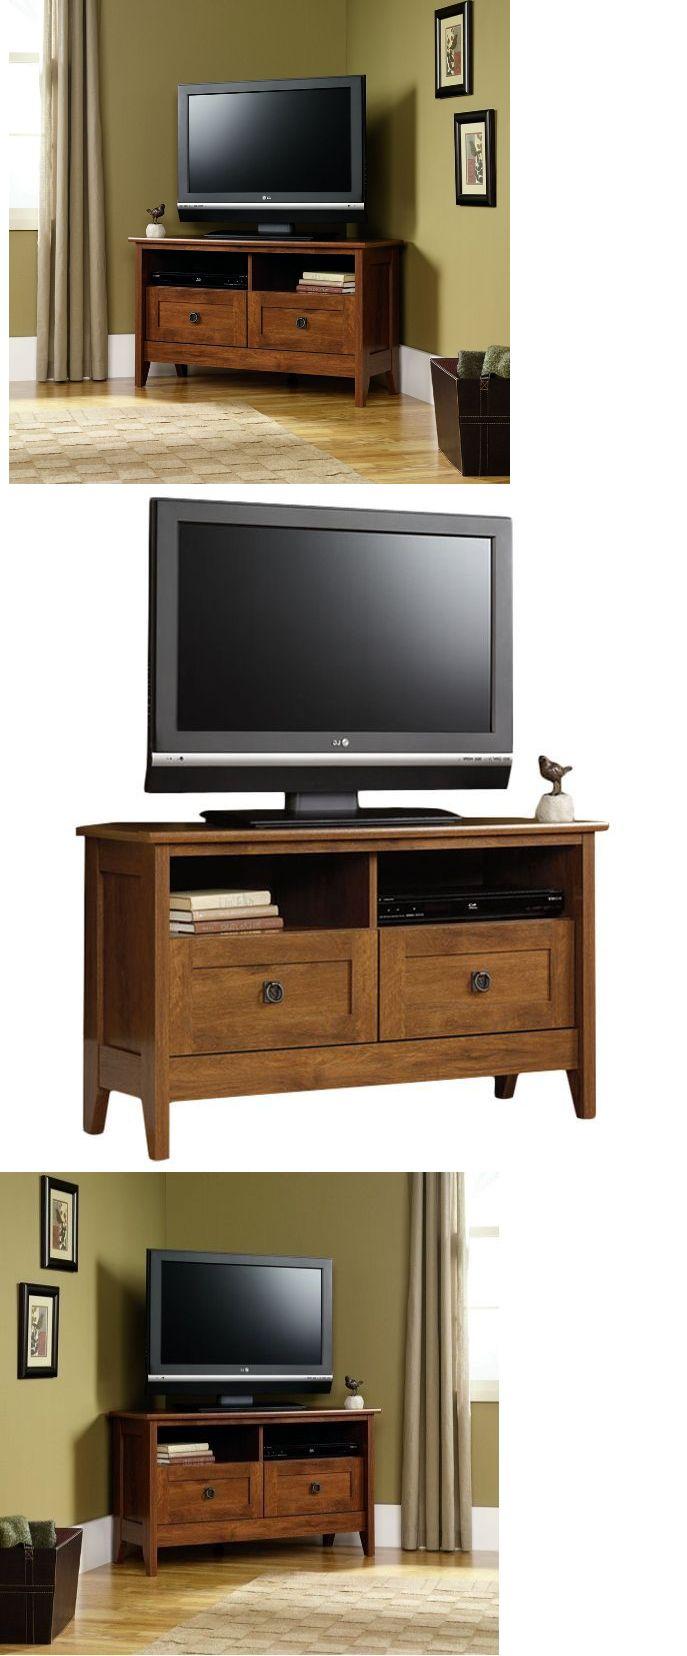 best 10 tv stand corner ideas on pinterest corner tv corner tv unit and corner tv shelves. Black Bedroom Furniture Sets. Home Design Ideas